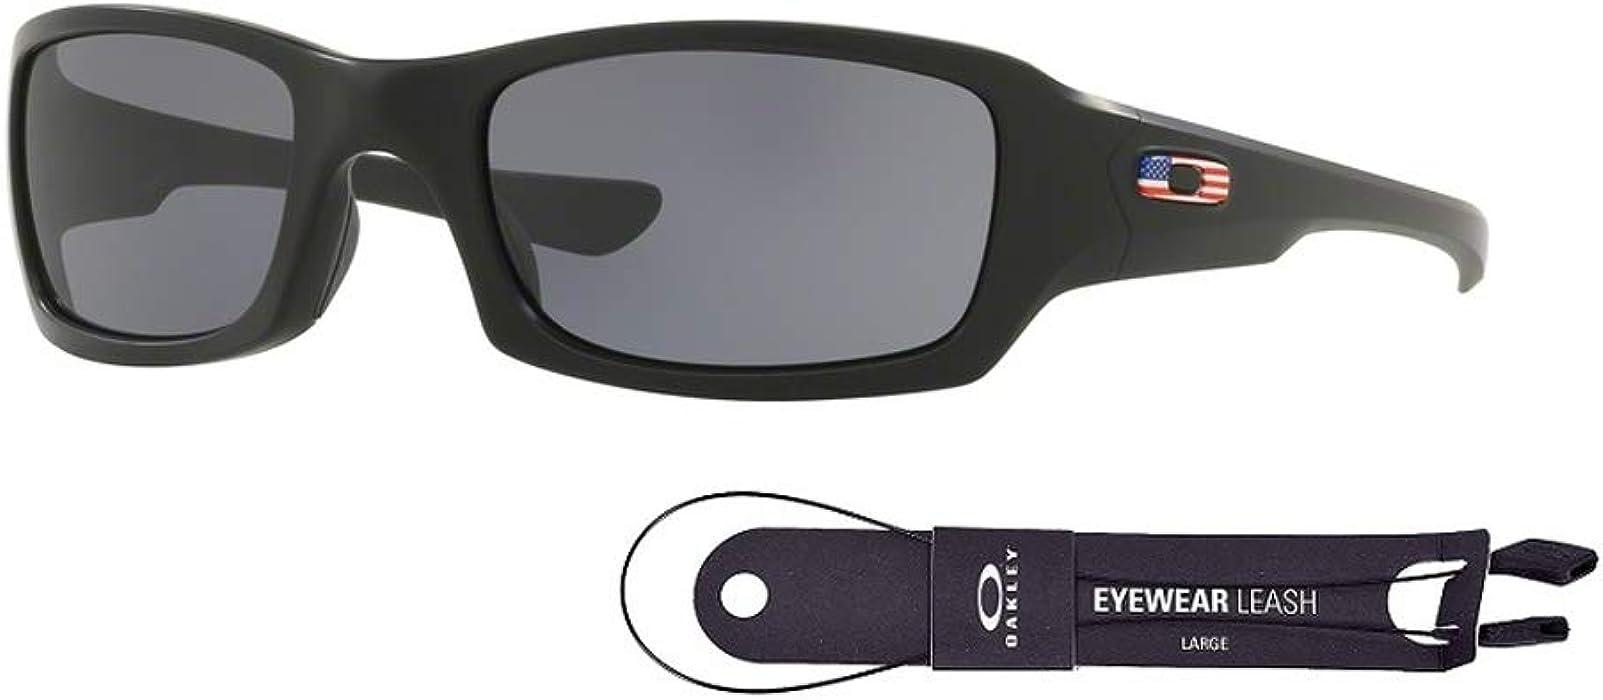 93e2ab1624 Oakley Fives Squared Matte Black Polarized